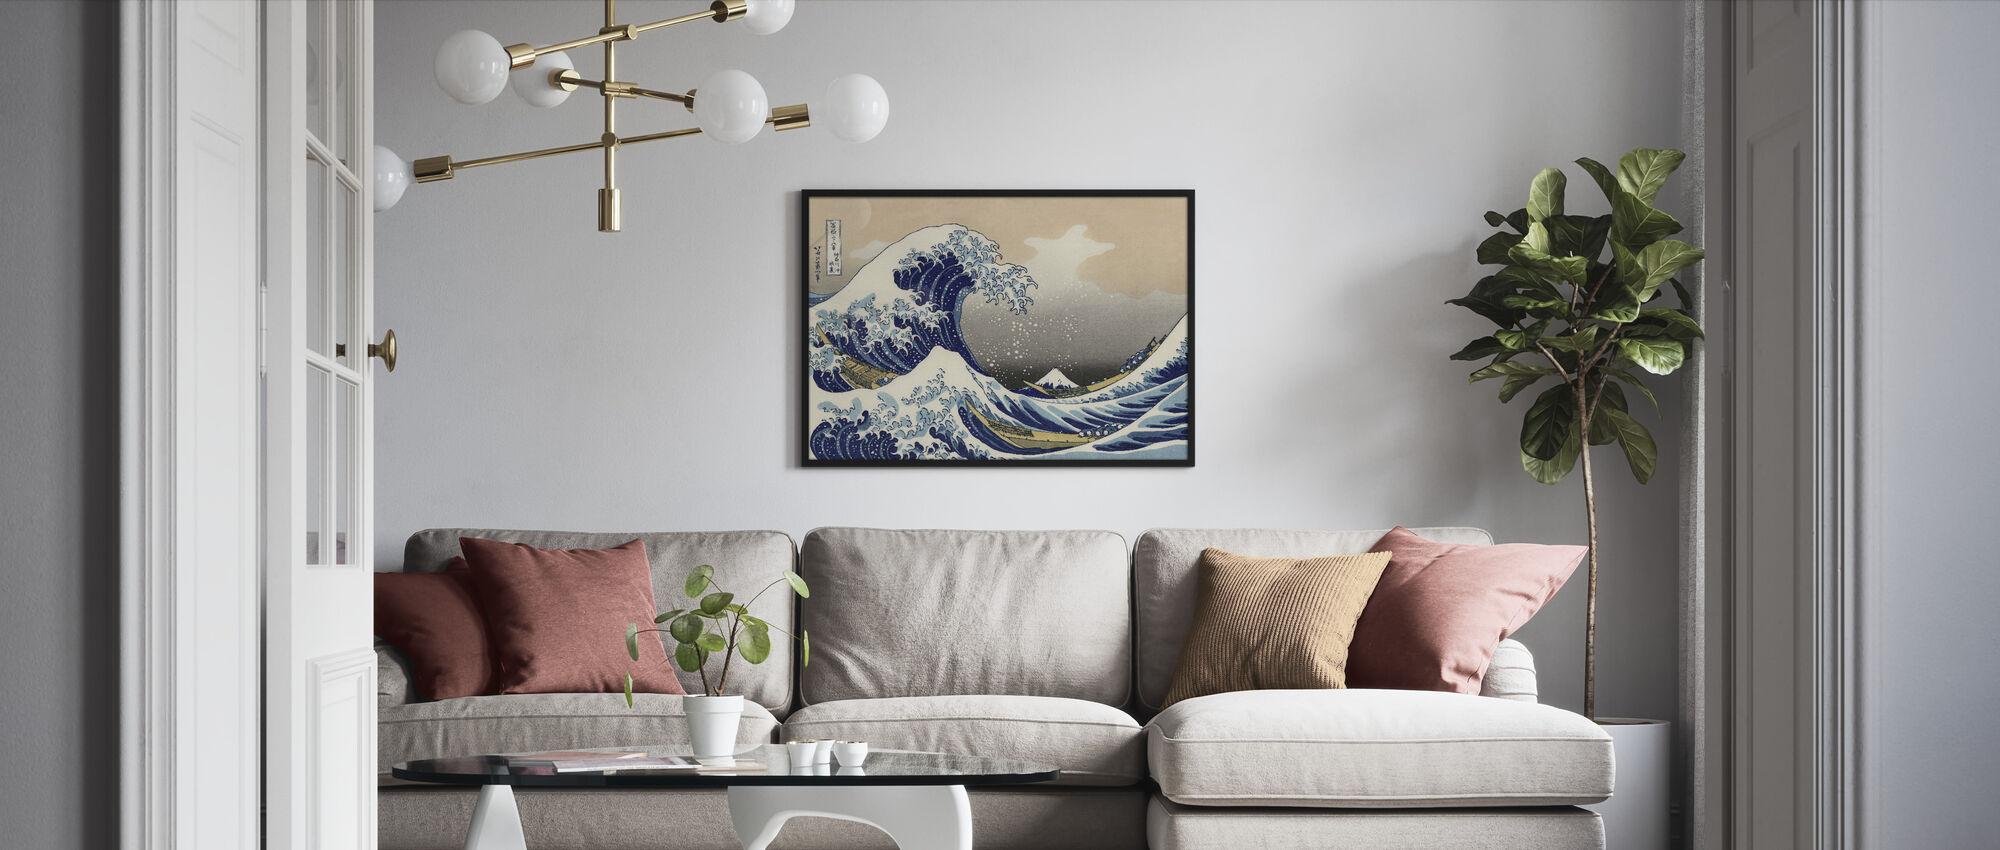 Great Wave, Katsushika Hokusai - Framed print - Living Room